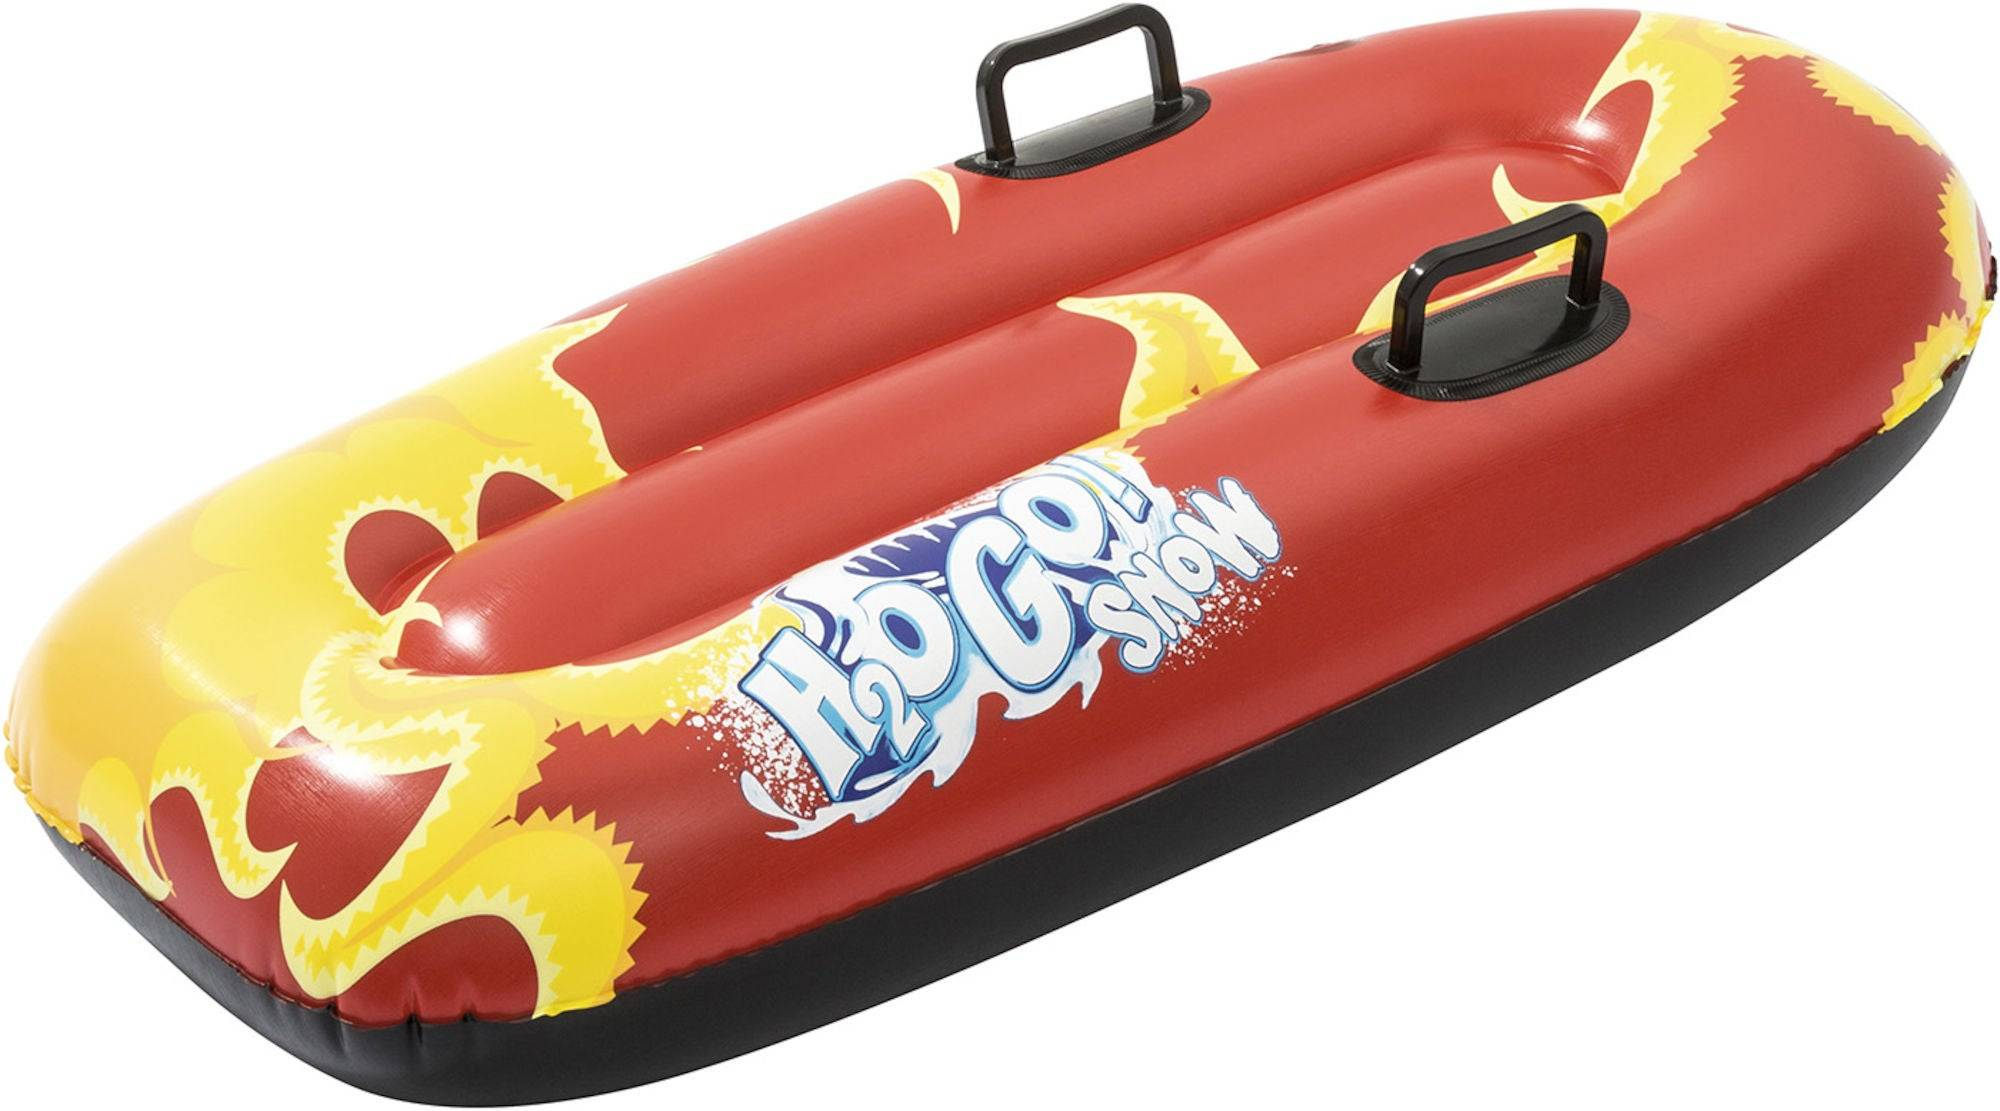 Bestway H2OGO! Flurryz Sled